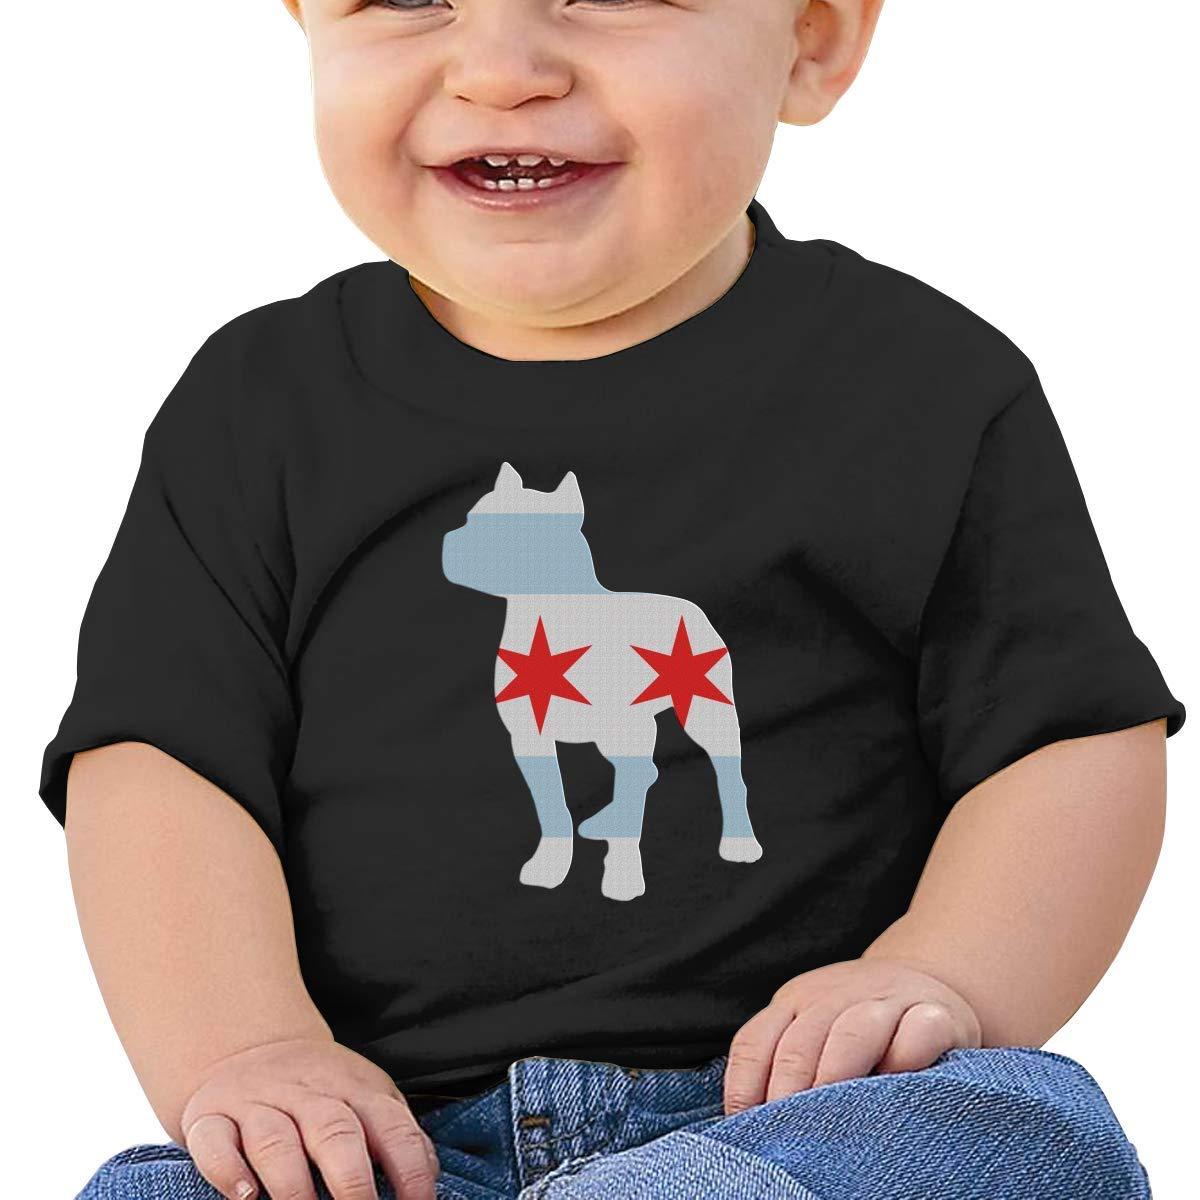 Patriotic Pitbull Chicago Flag Boy Girl Newborn Short Sleeve Tee Shirt 6-24 Month Soft Tops